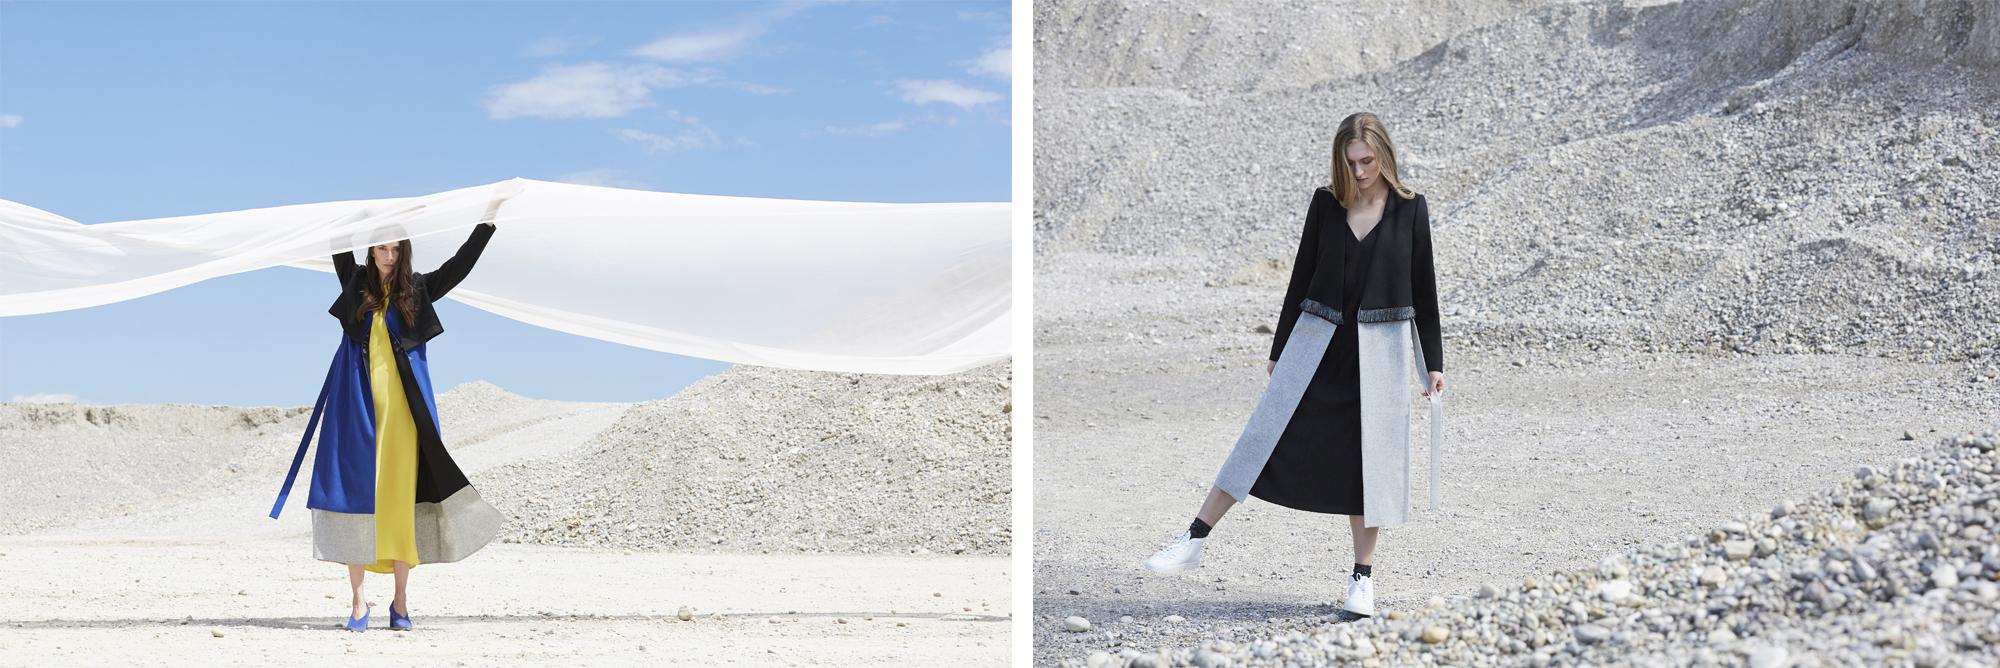 akjumii – nachhaltige High Fashion